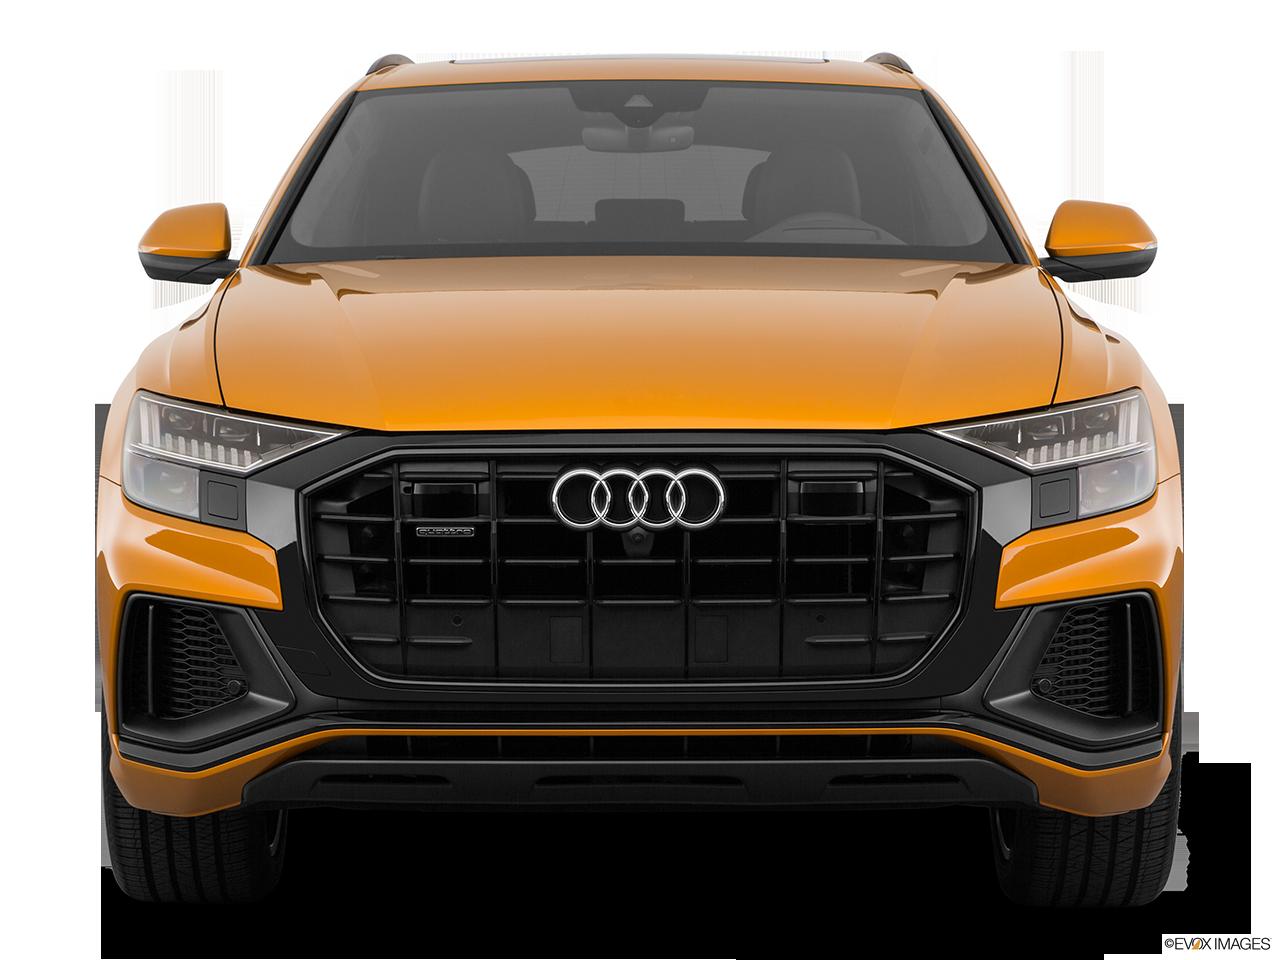 2020 Audi Q8 photo